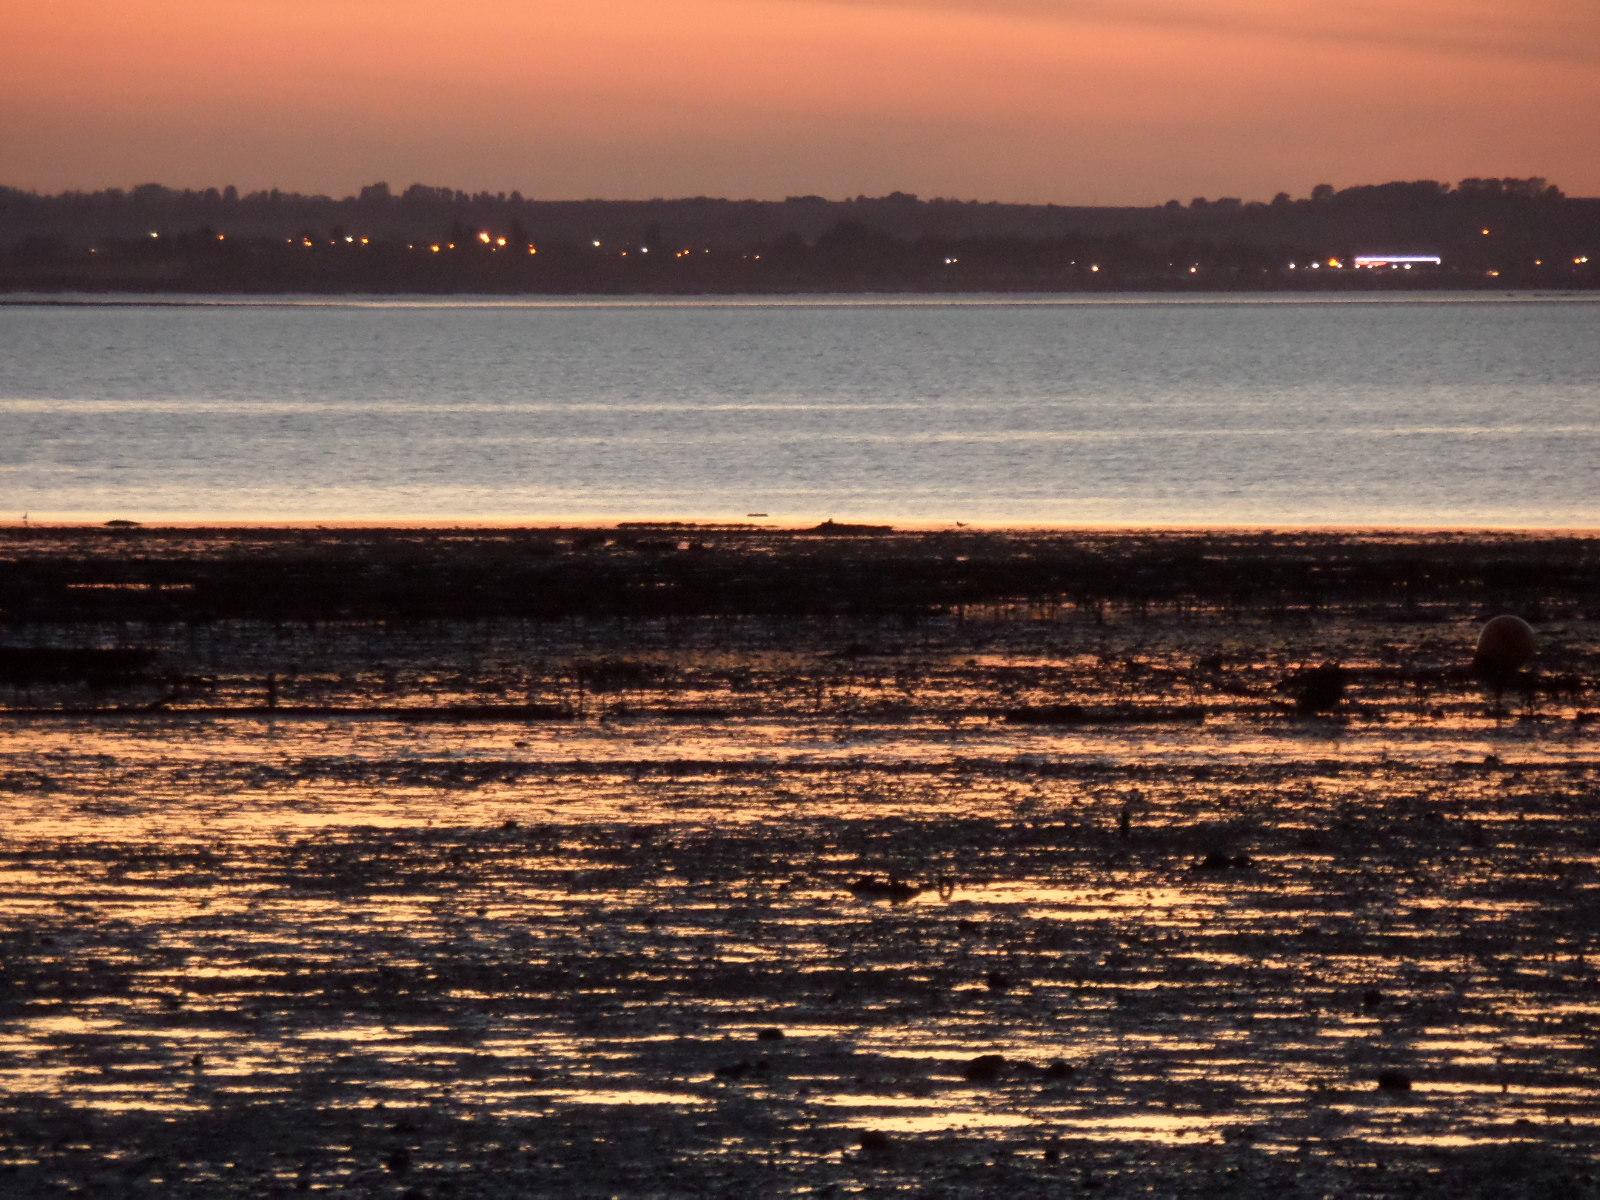 Sunset over sheppy